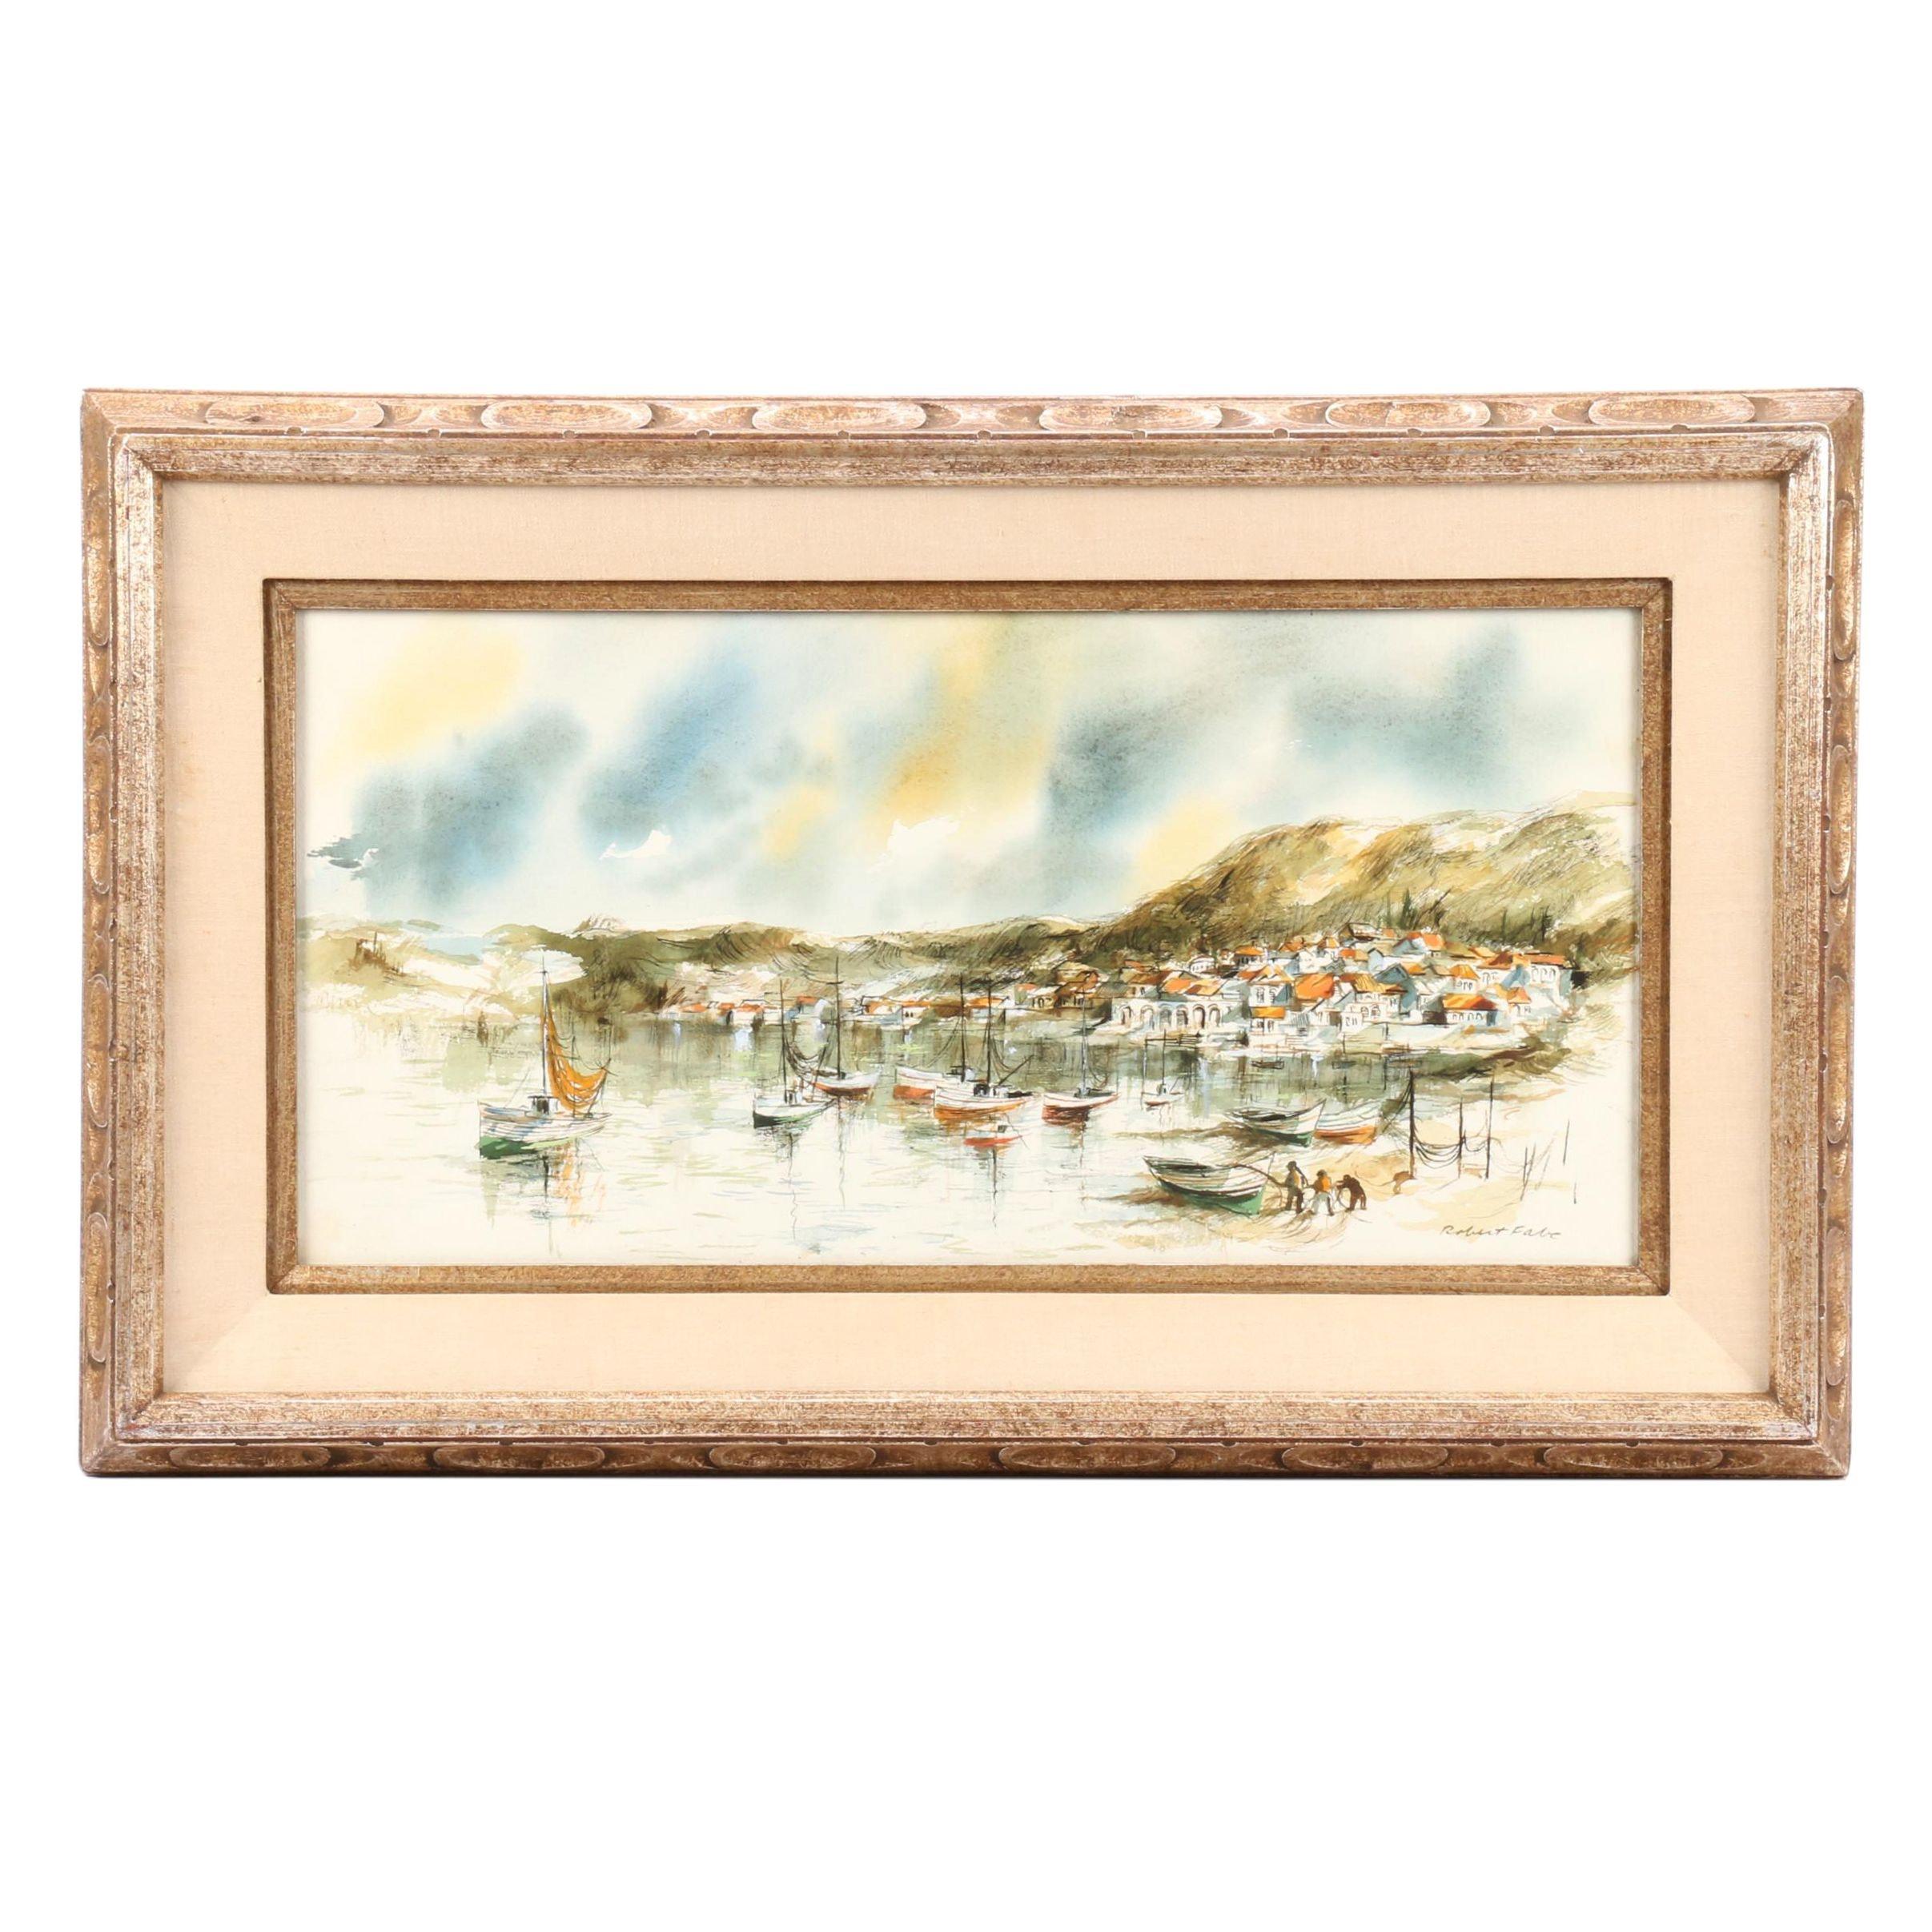 Robert Fabe Watercolor Painting of Harbor Scene